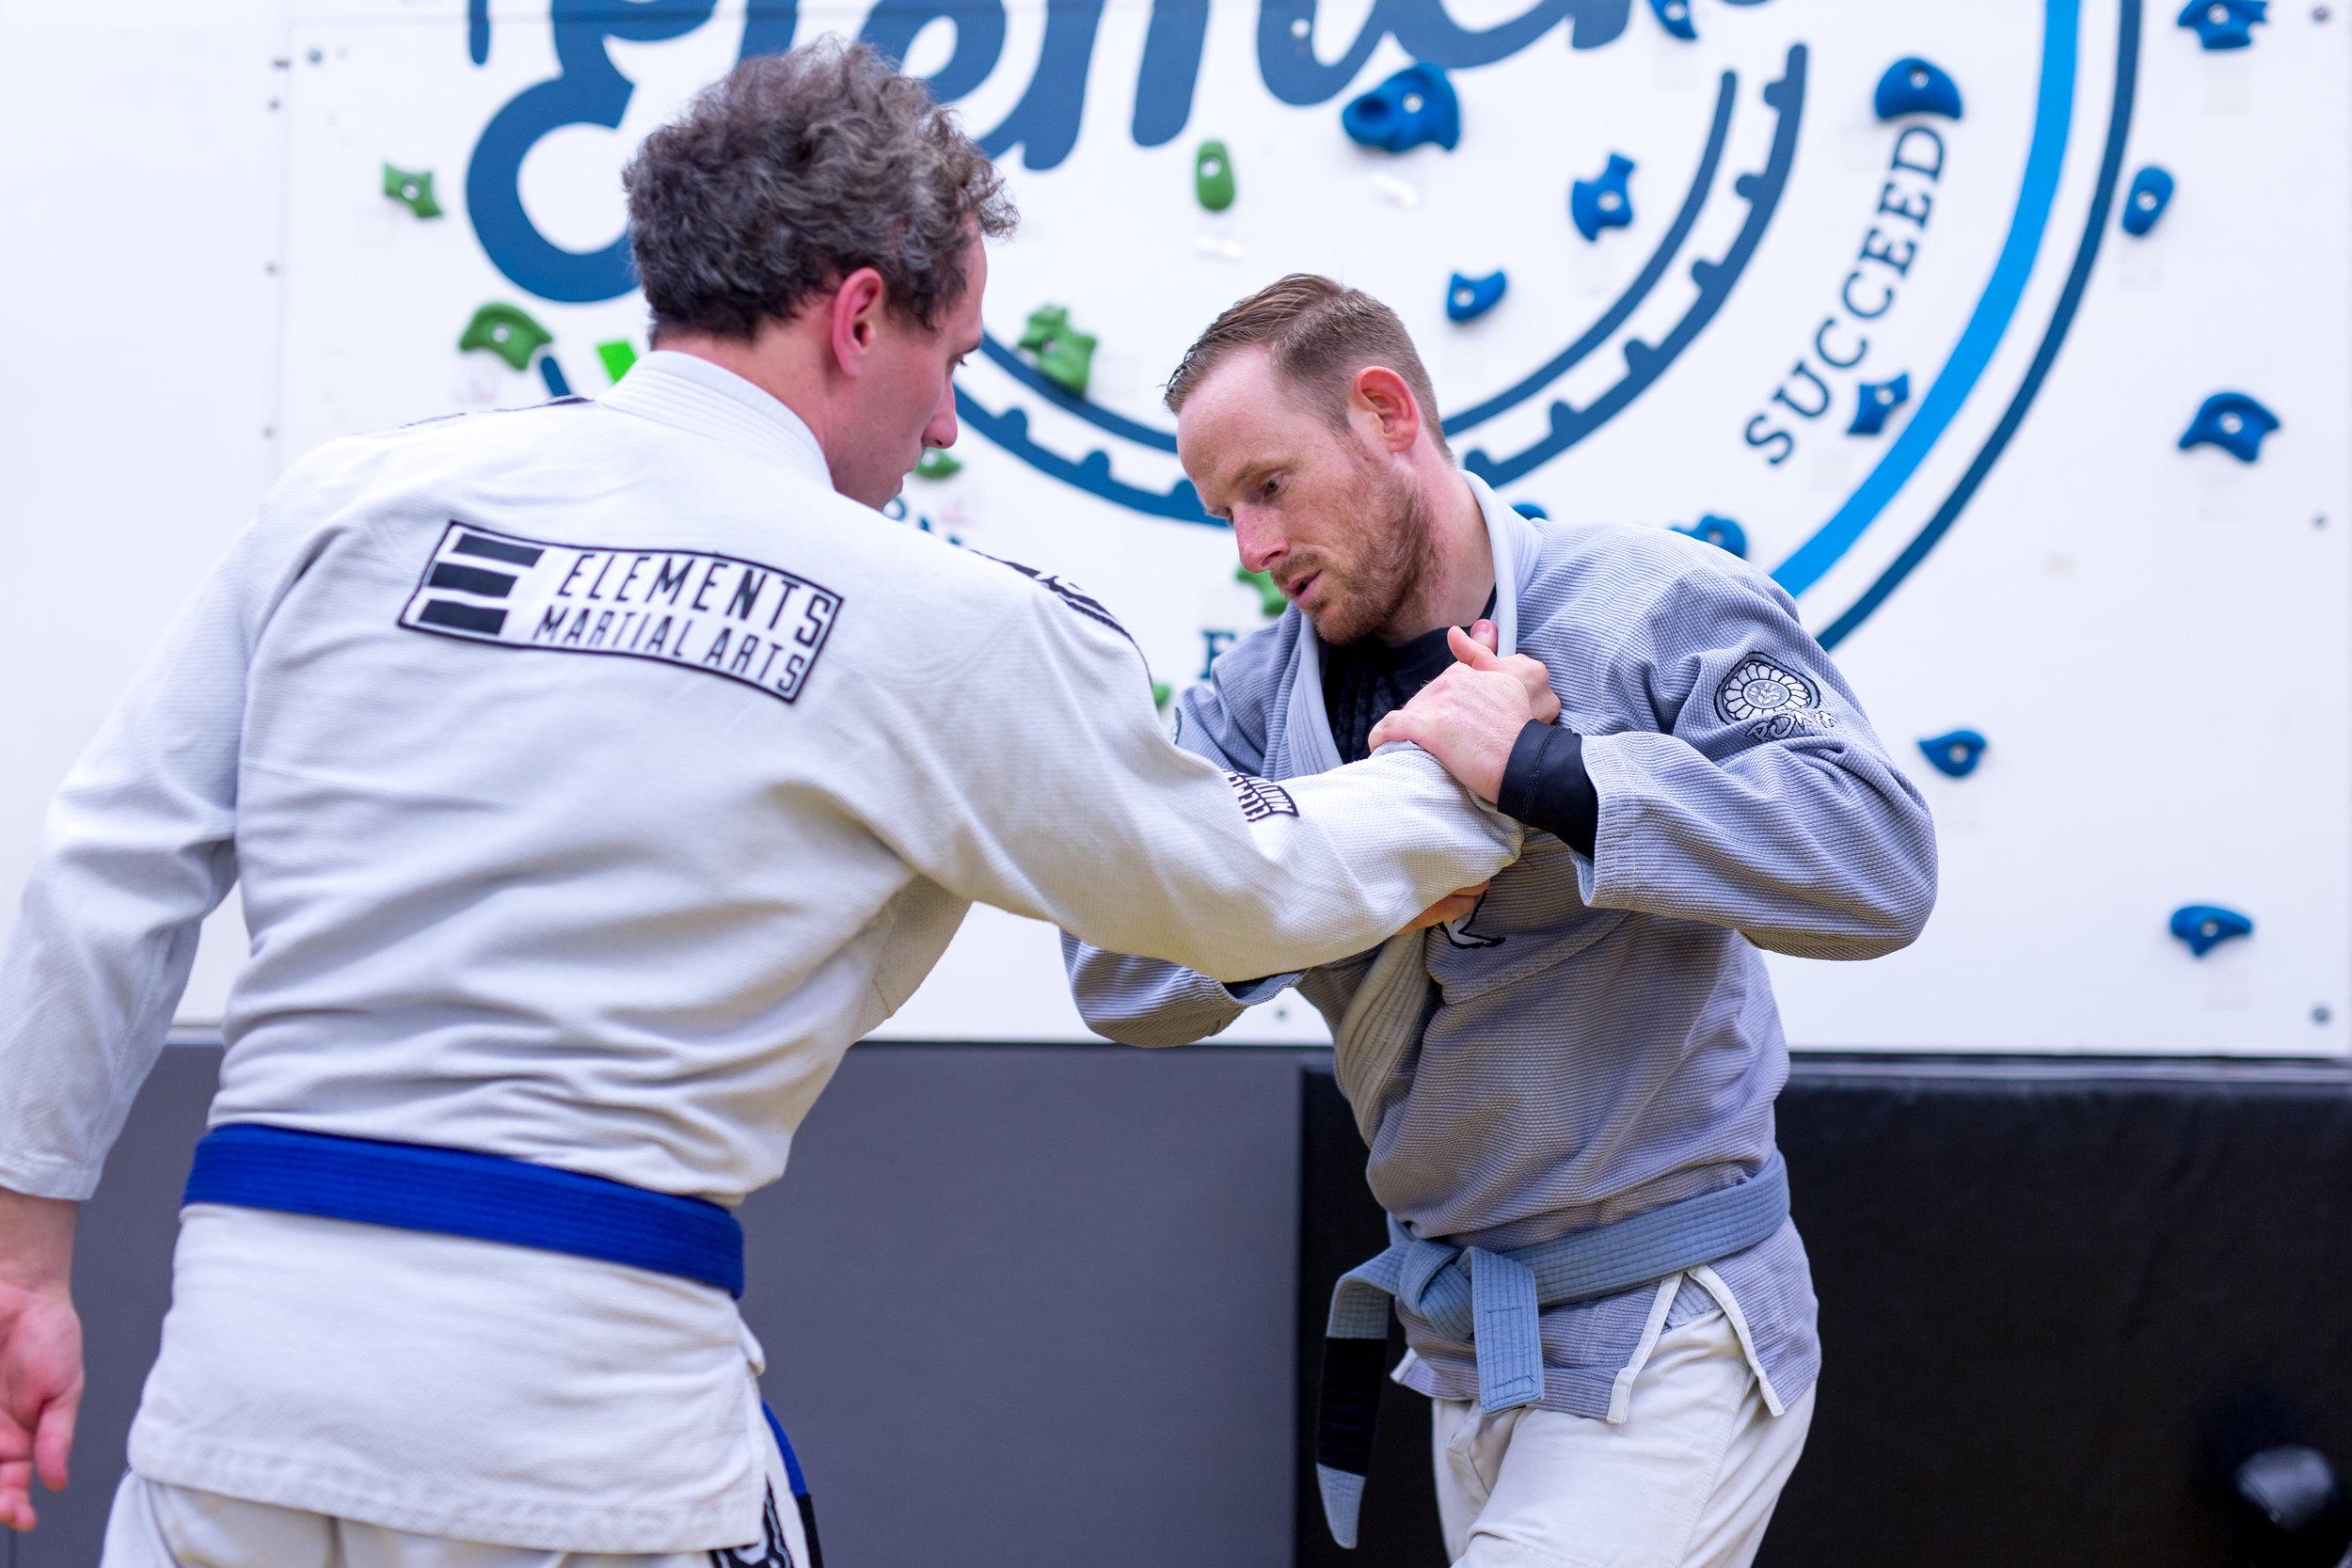 Martial Arts Classes Lewes BJJ Brazillian Jiu Jitsu